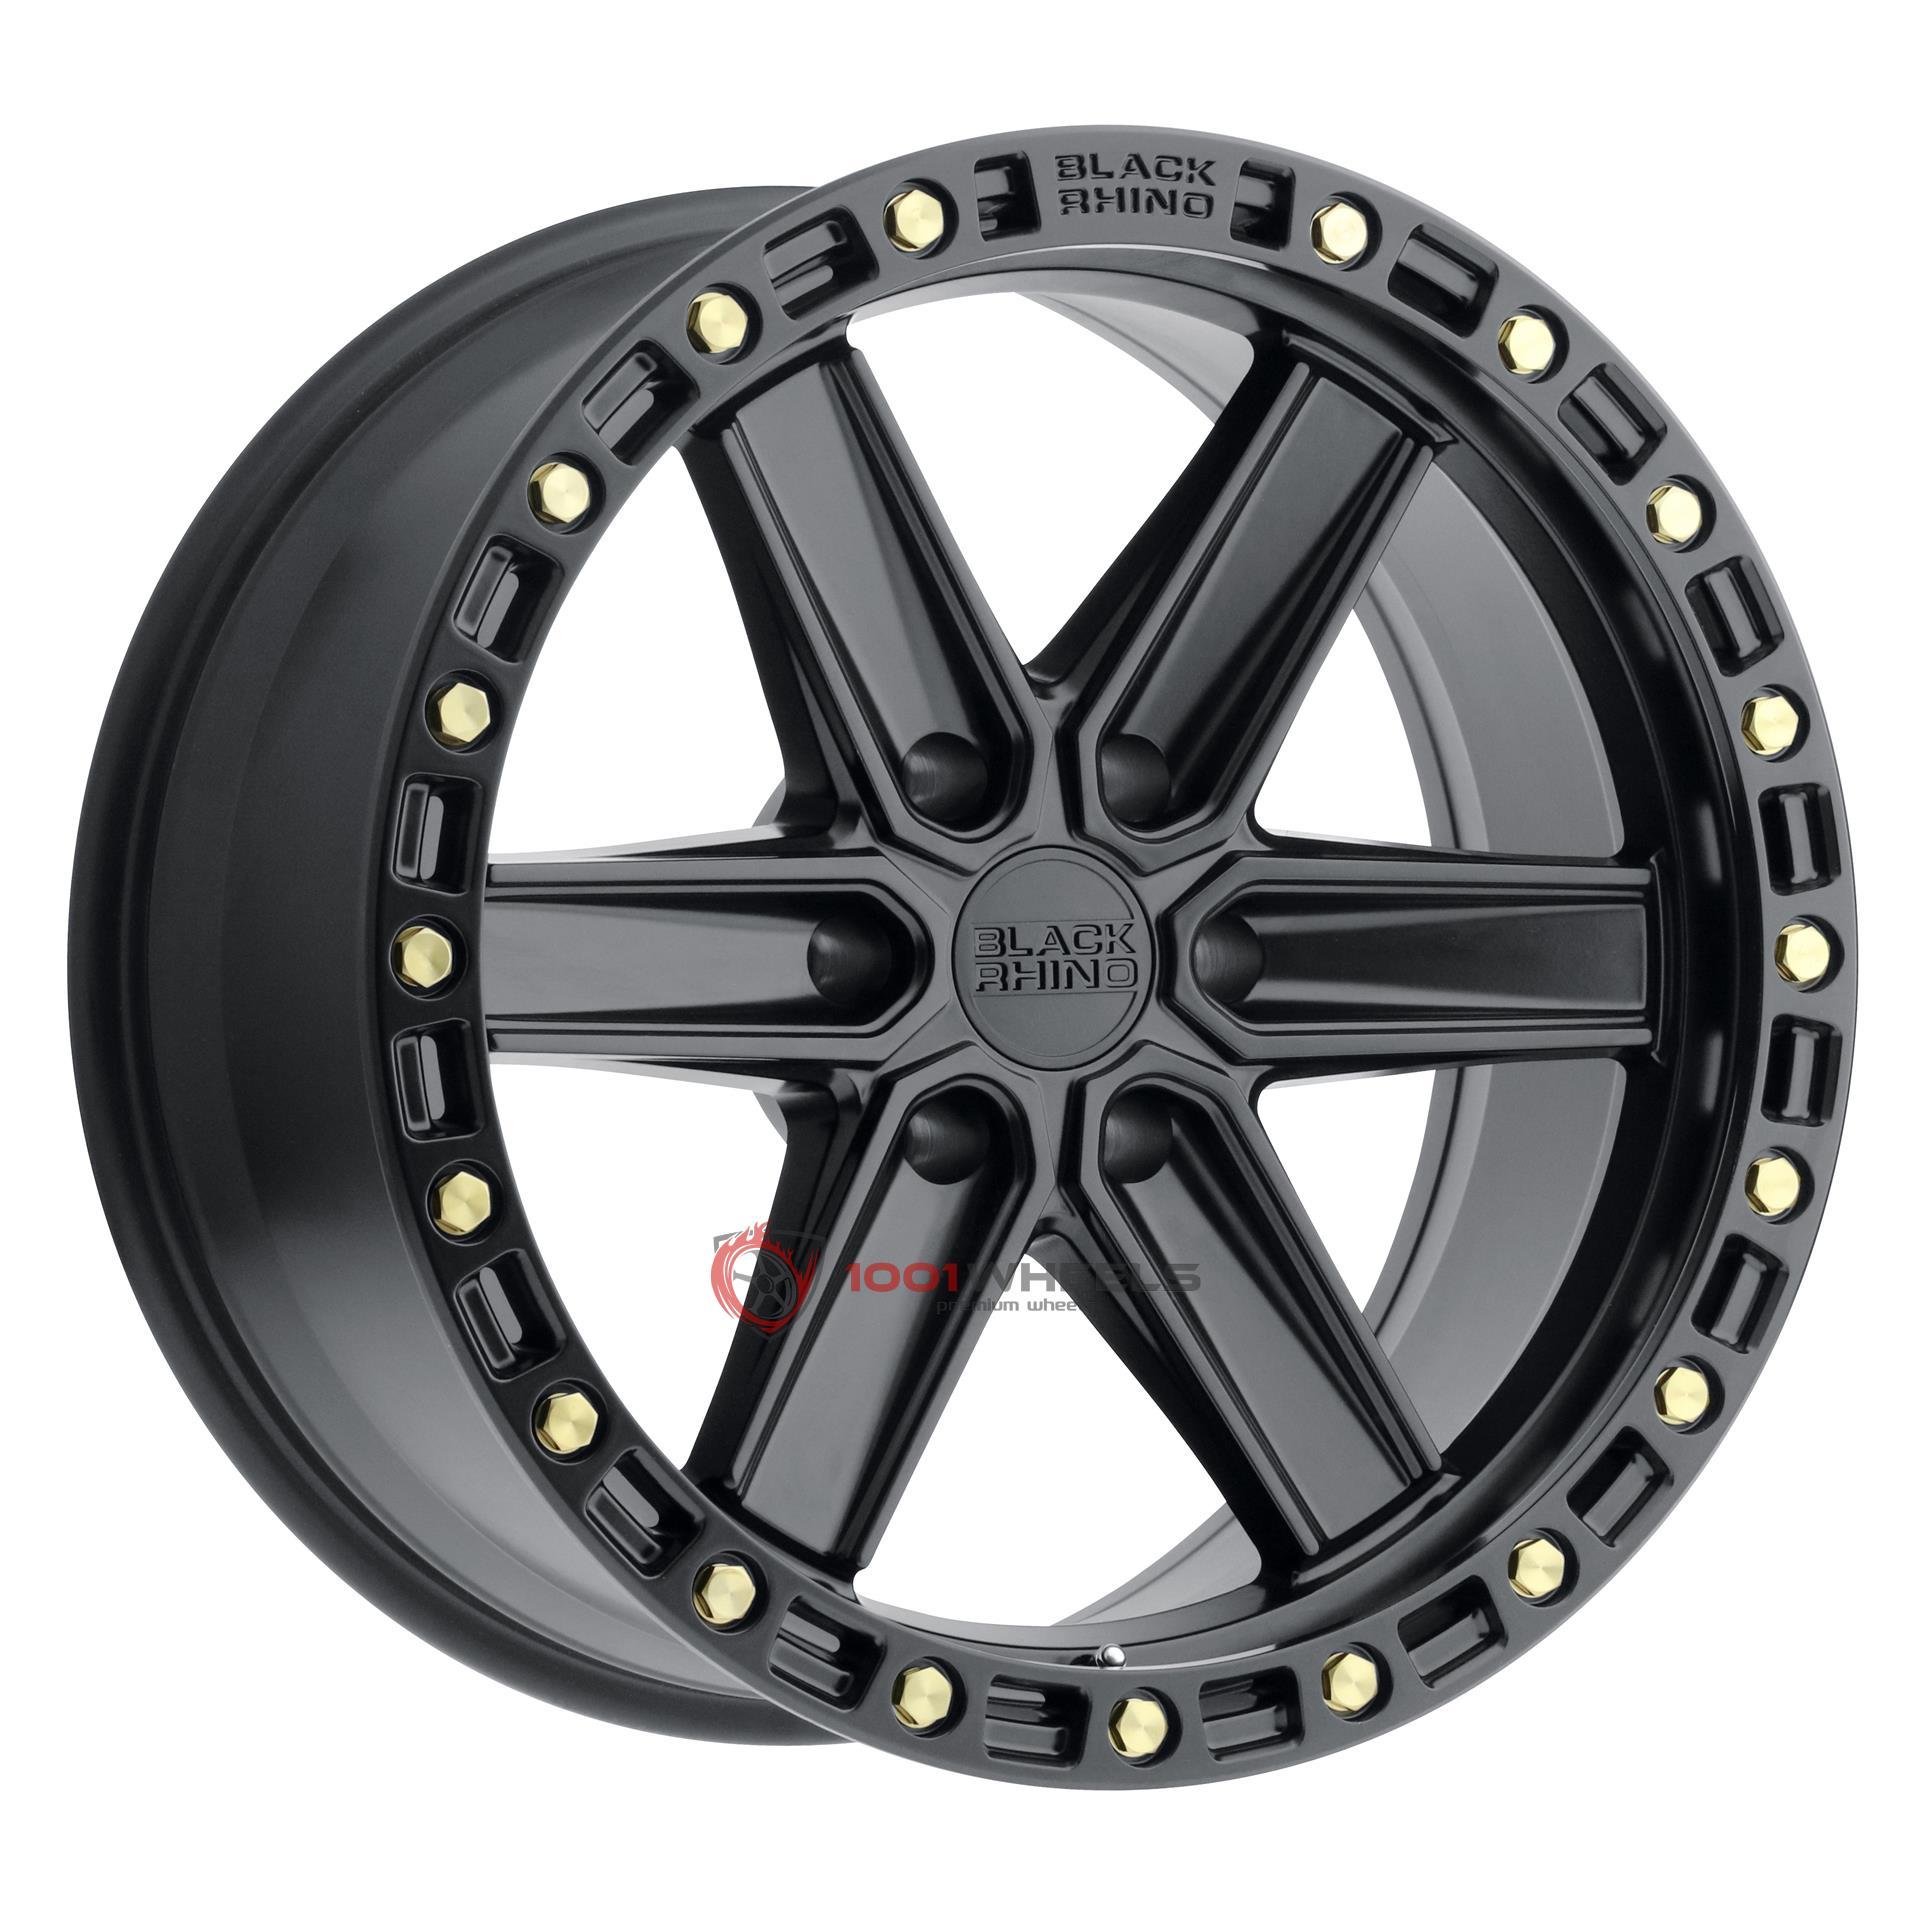 BLACK RHINO HENDERSON matte-black-wbrass-bolts